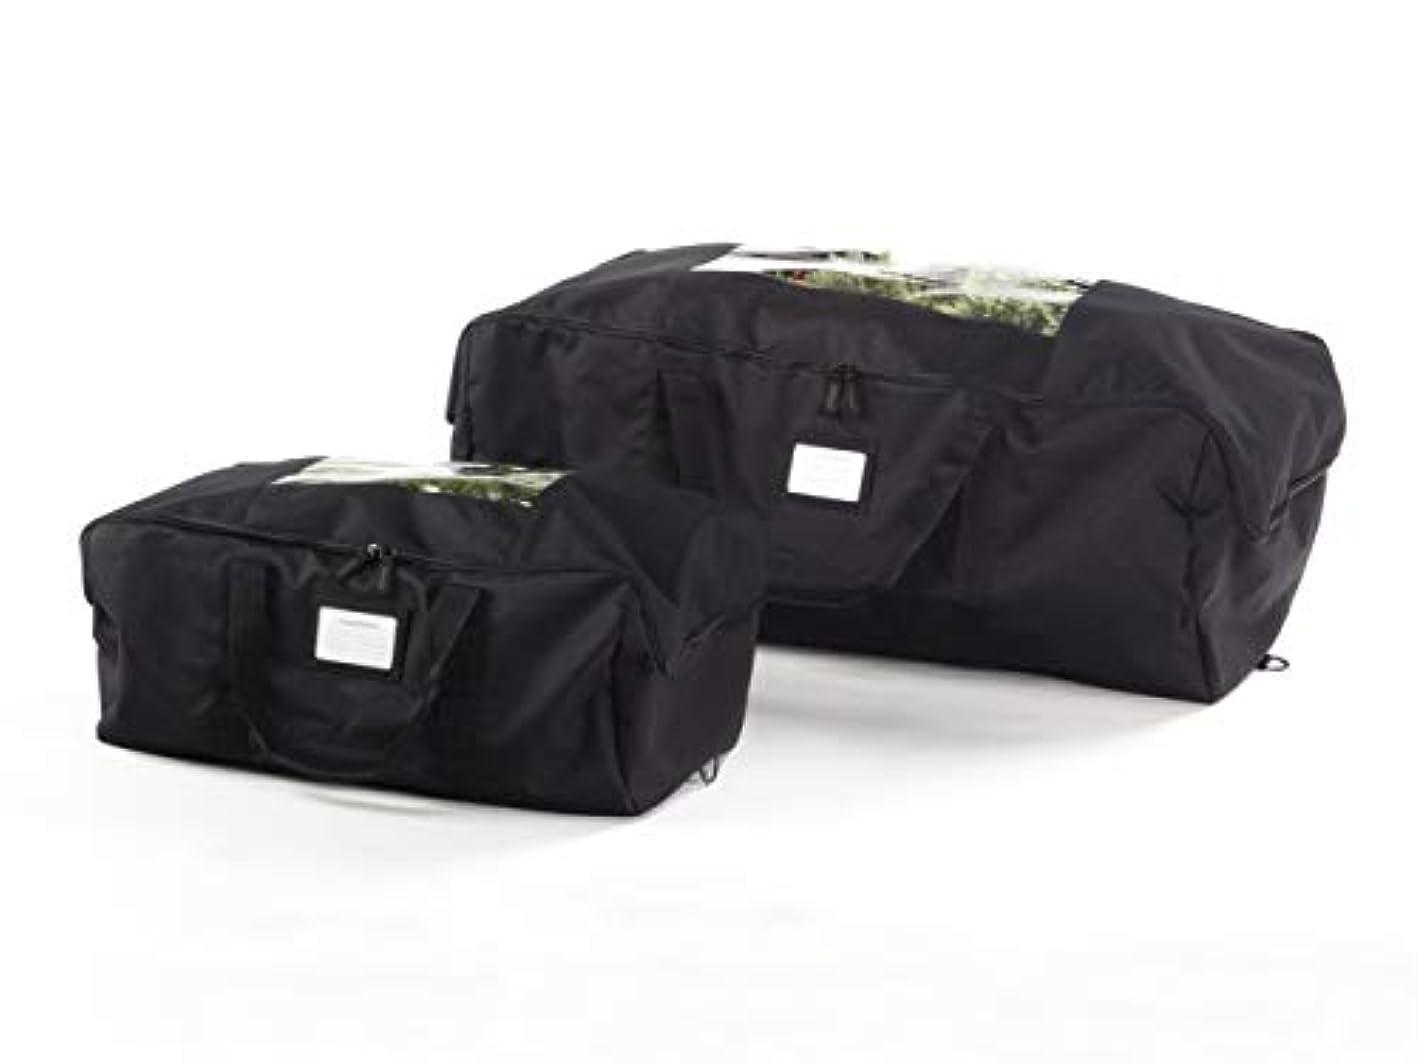 Covermates – 2PC Holiday Tree Storage Bag Set (24